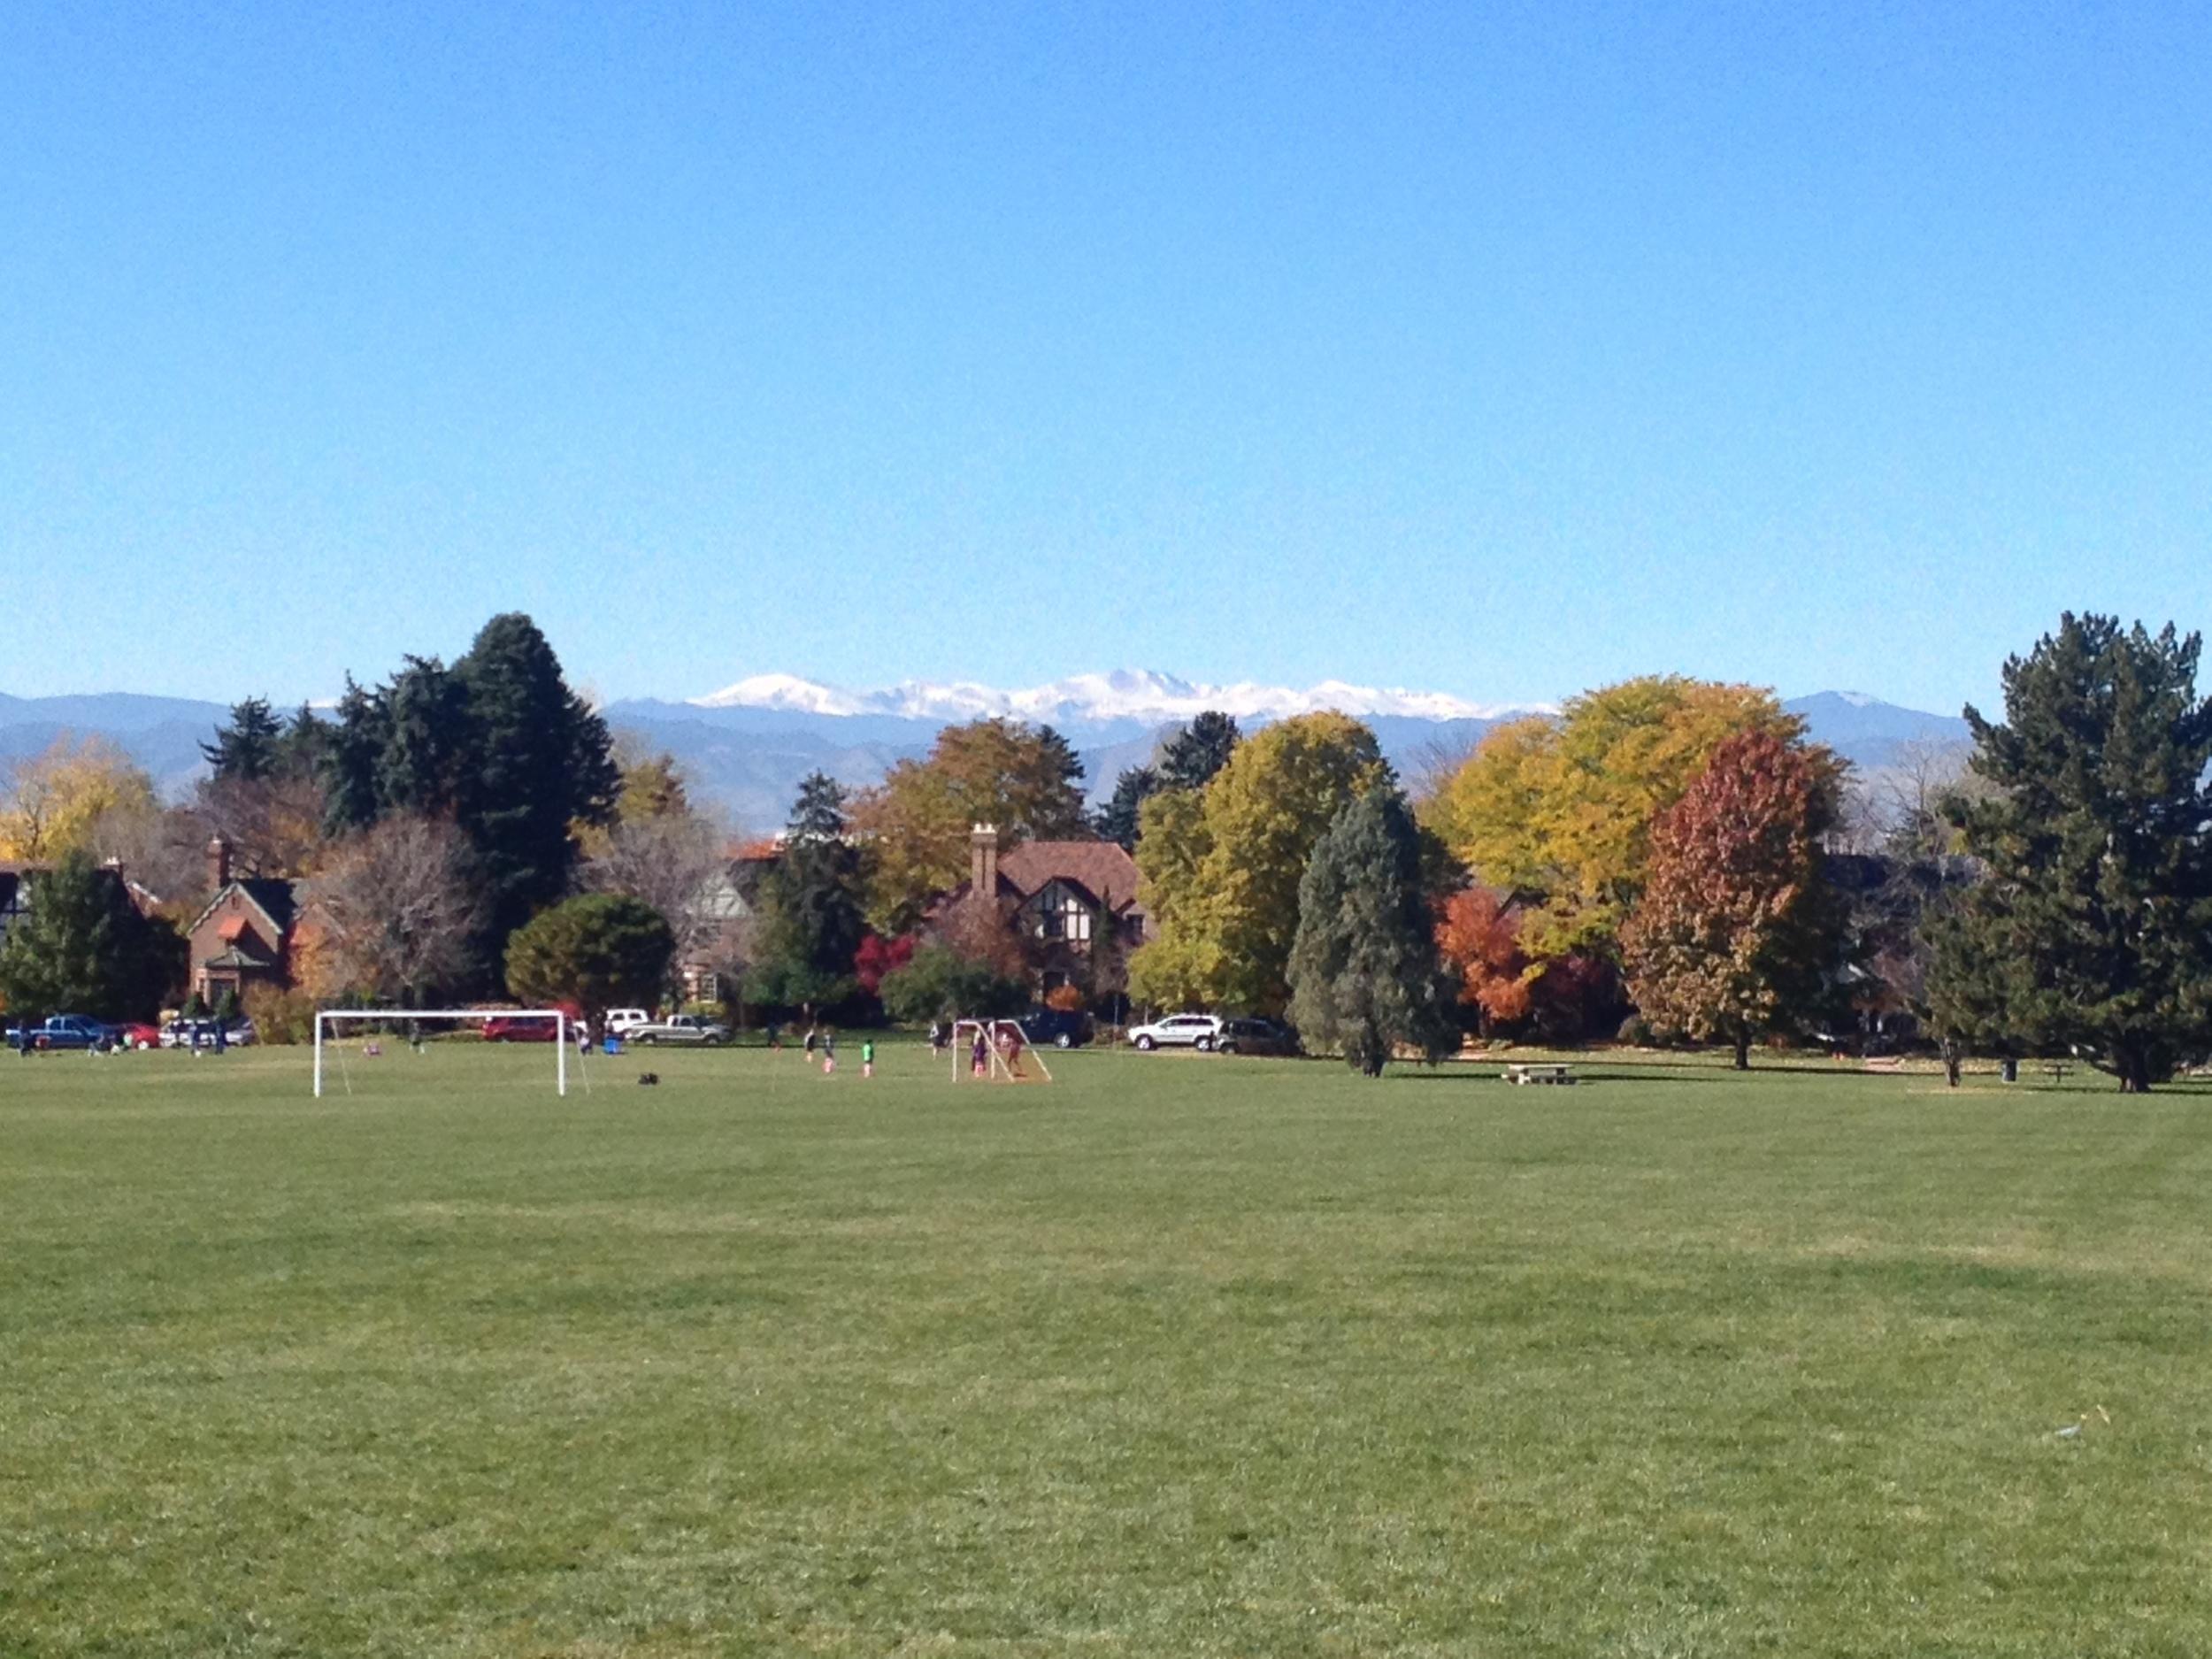 Gorgeous fall Saturday in Colorado.